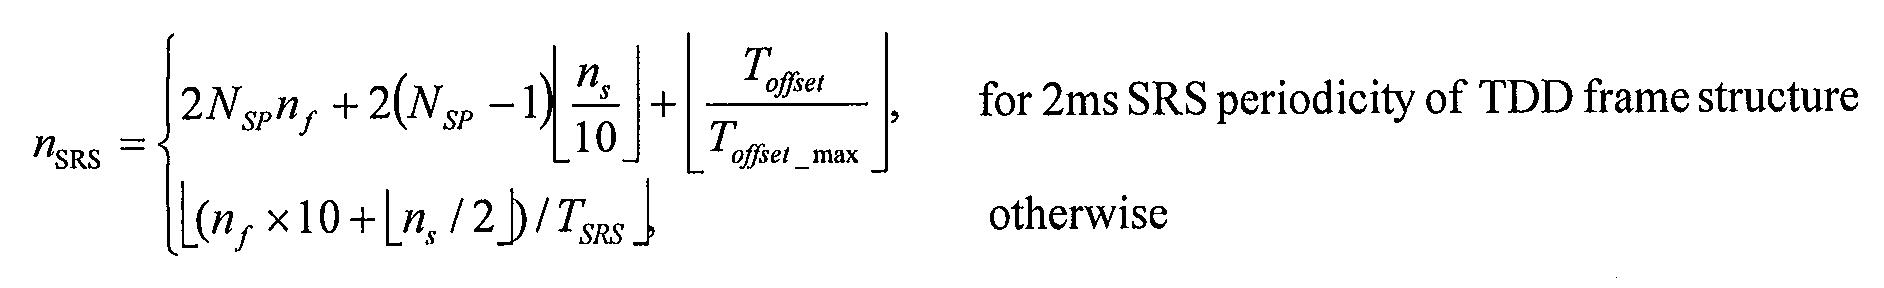 Figure 112010501694314-pat00016